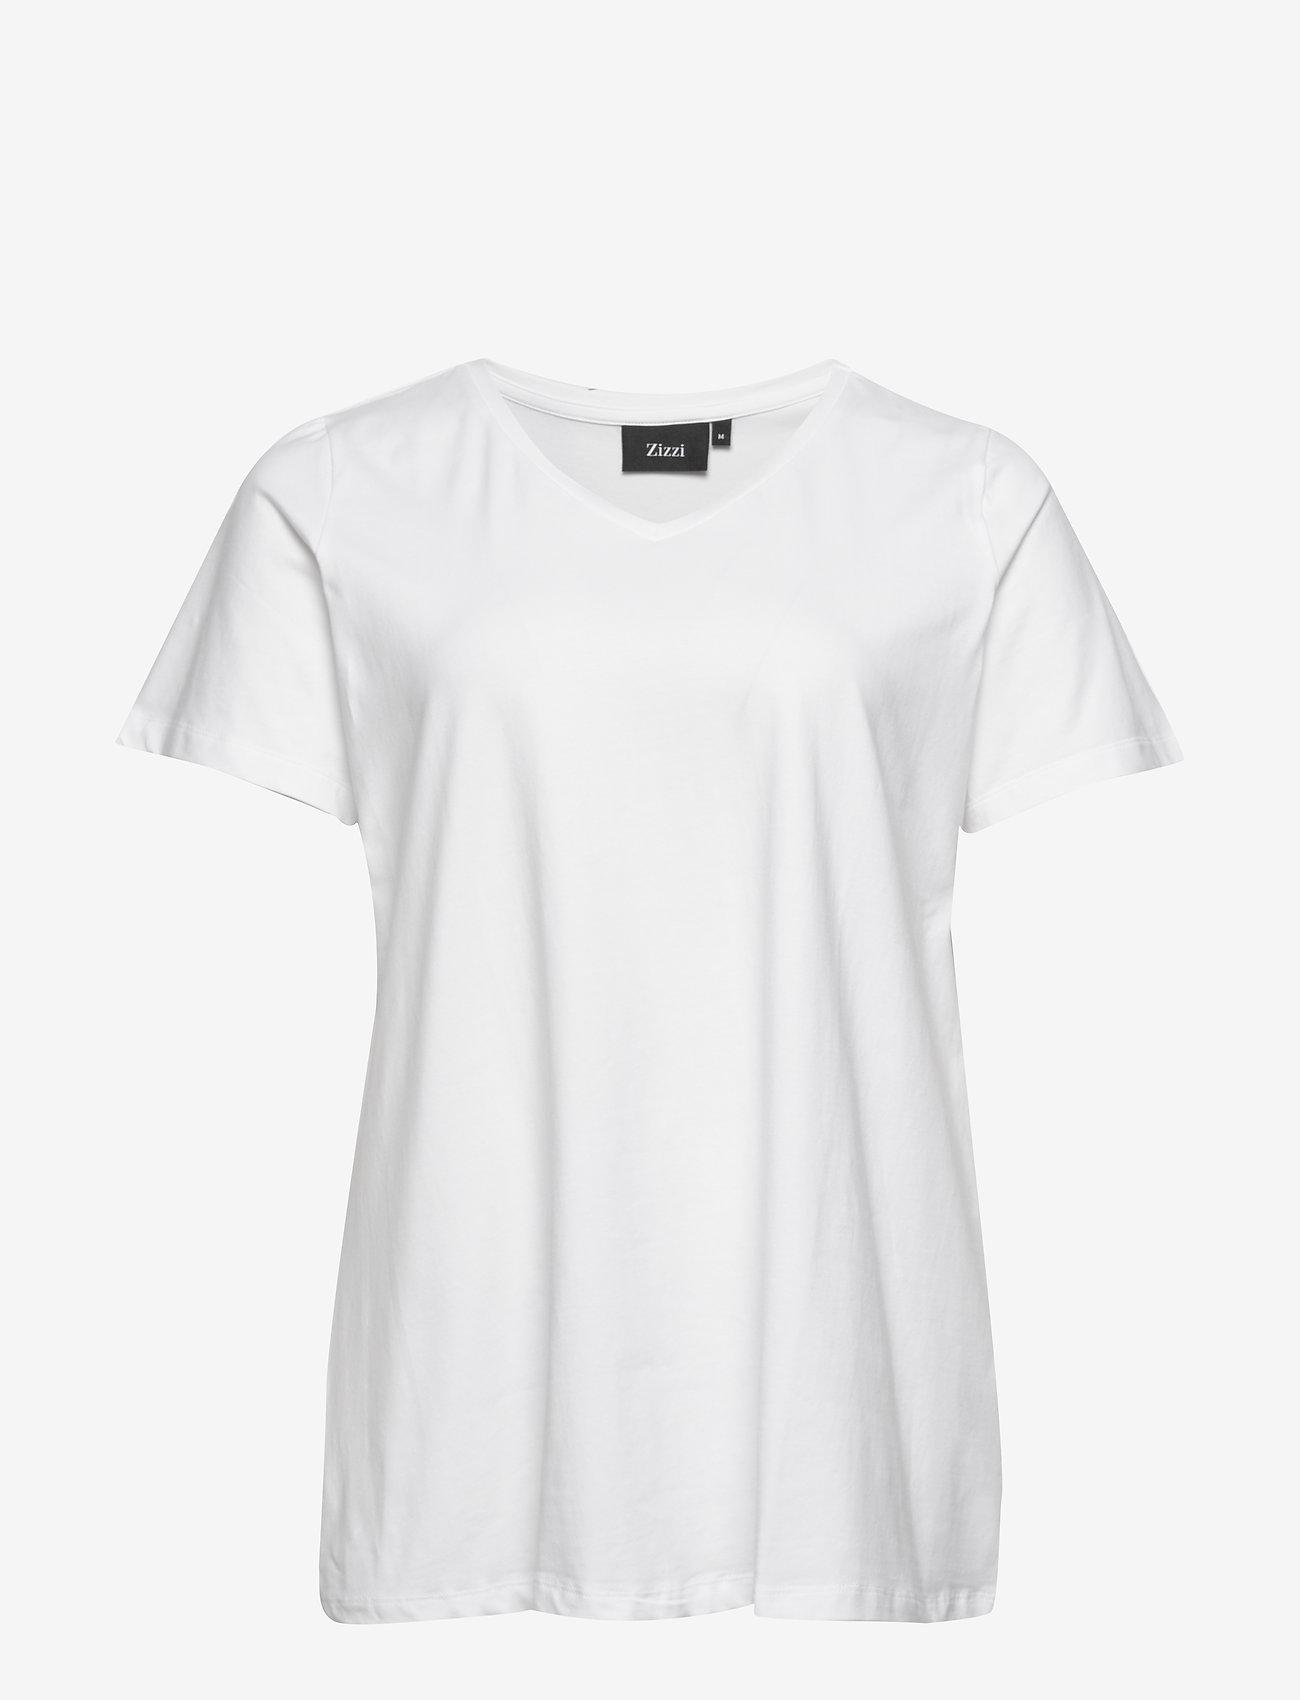 Zizzi S/S T-SHIRT NOOS - T-Shirts & Tops WHITE - Damen Kleidung